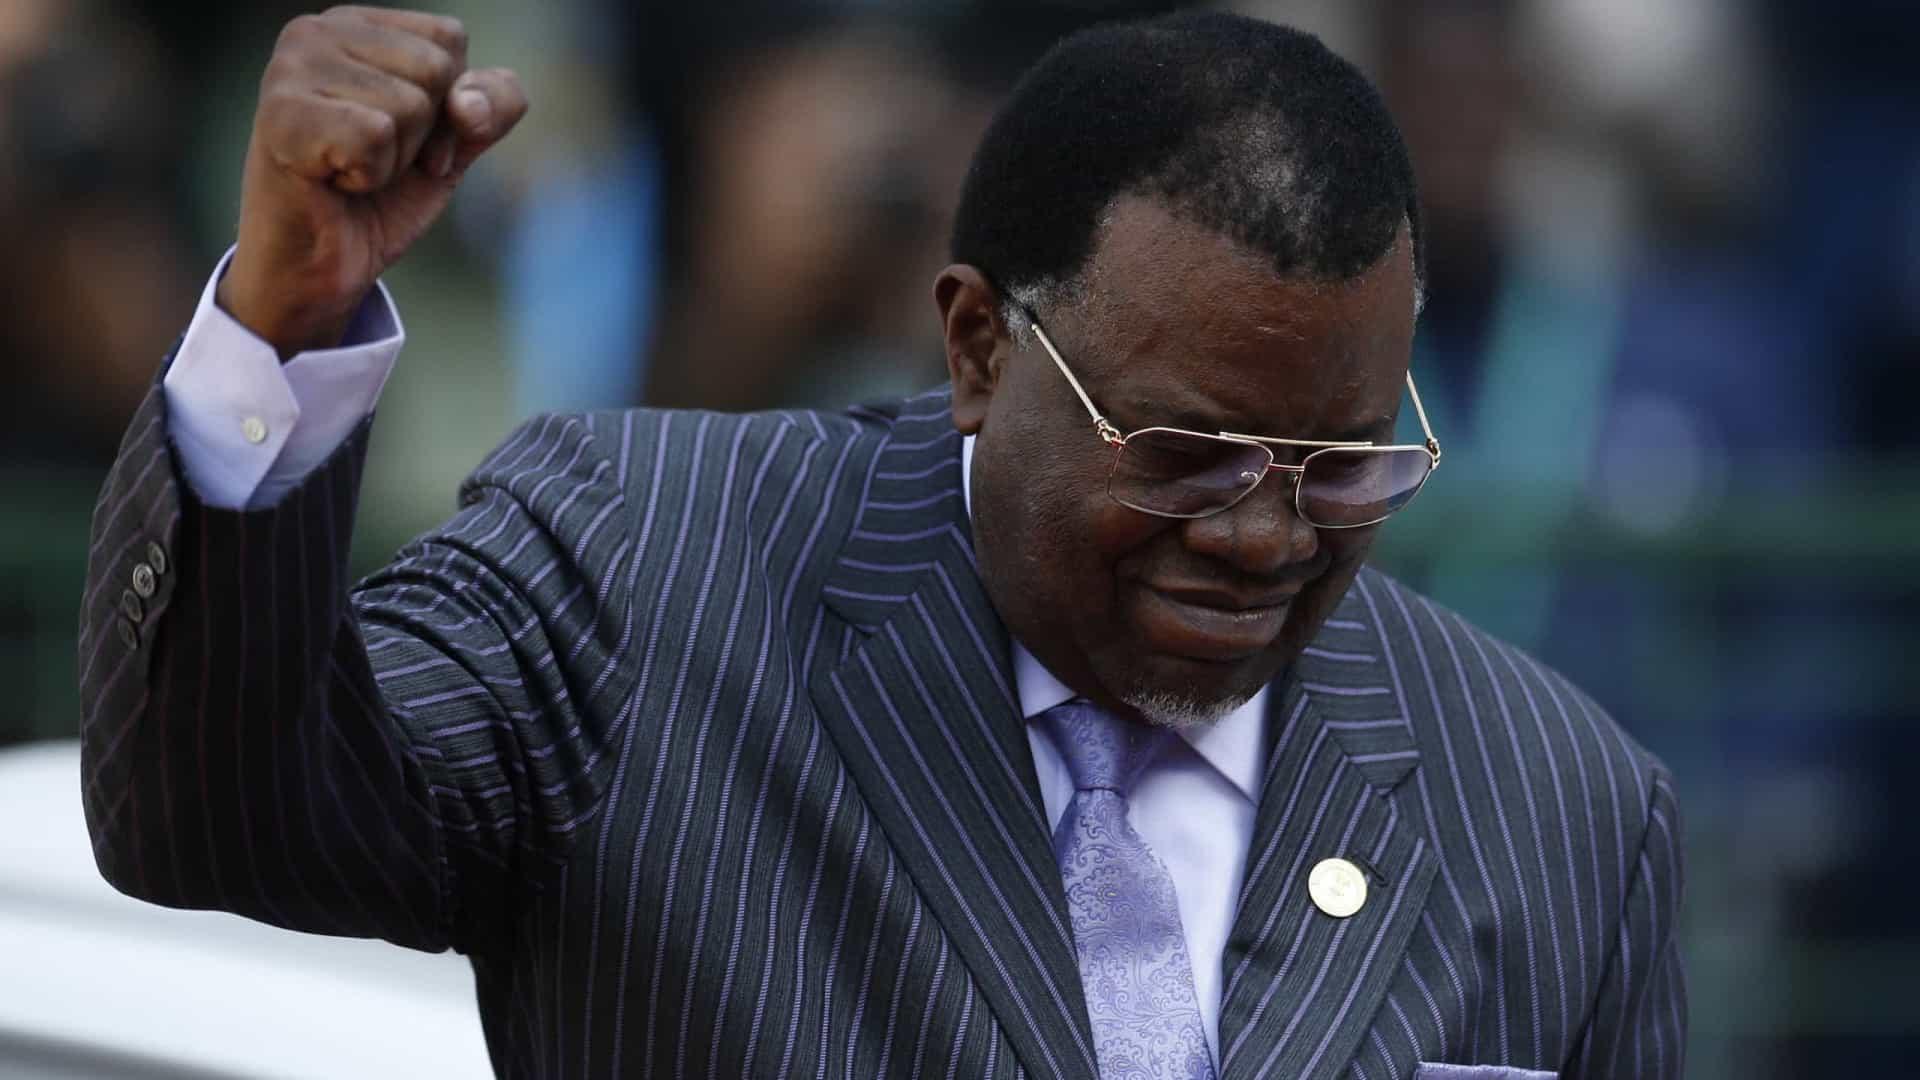 - Hage Geingob - Presidente namibiano Hage Geingob reeleito com 56,3% do votos